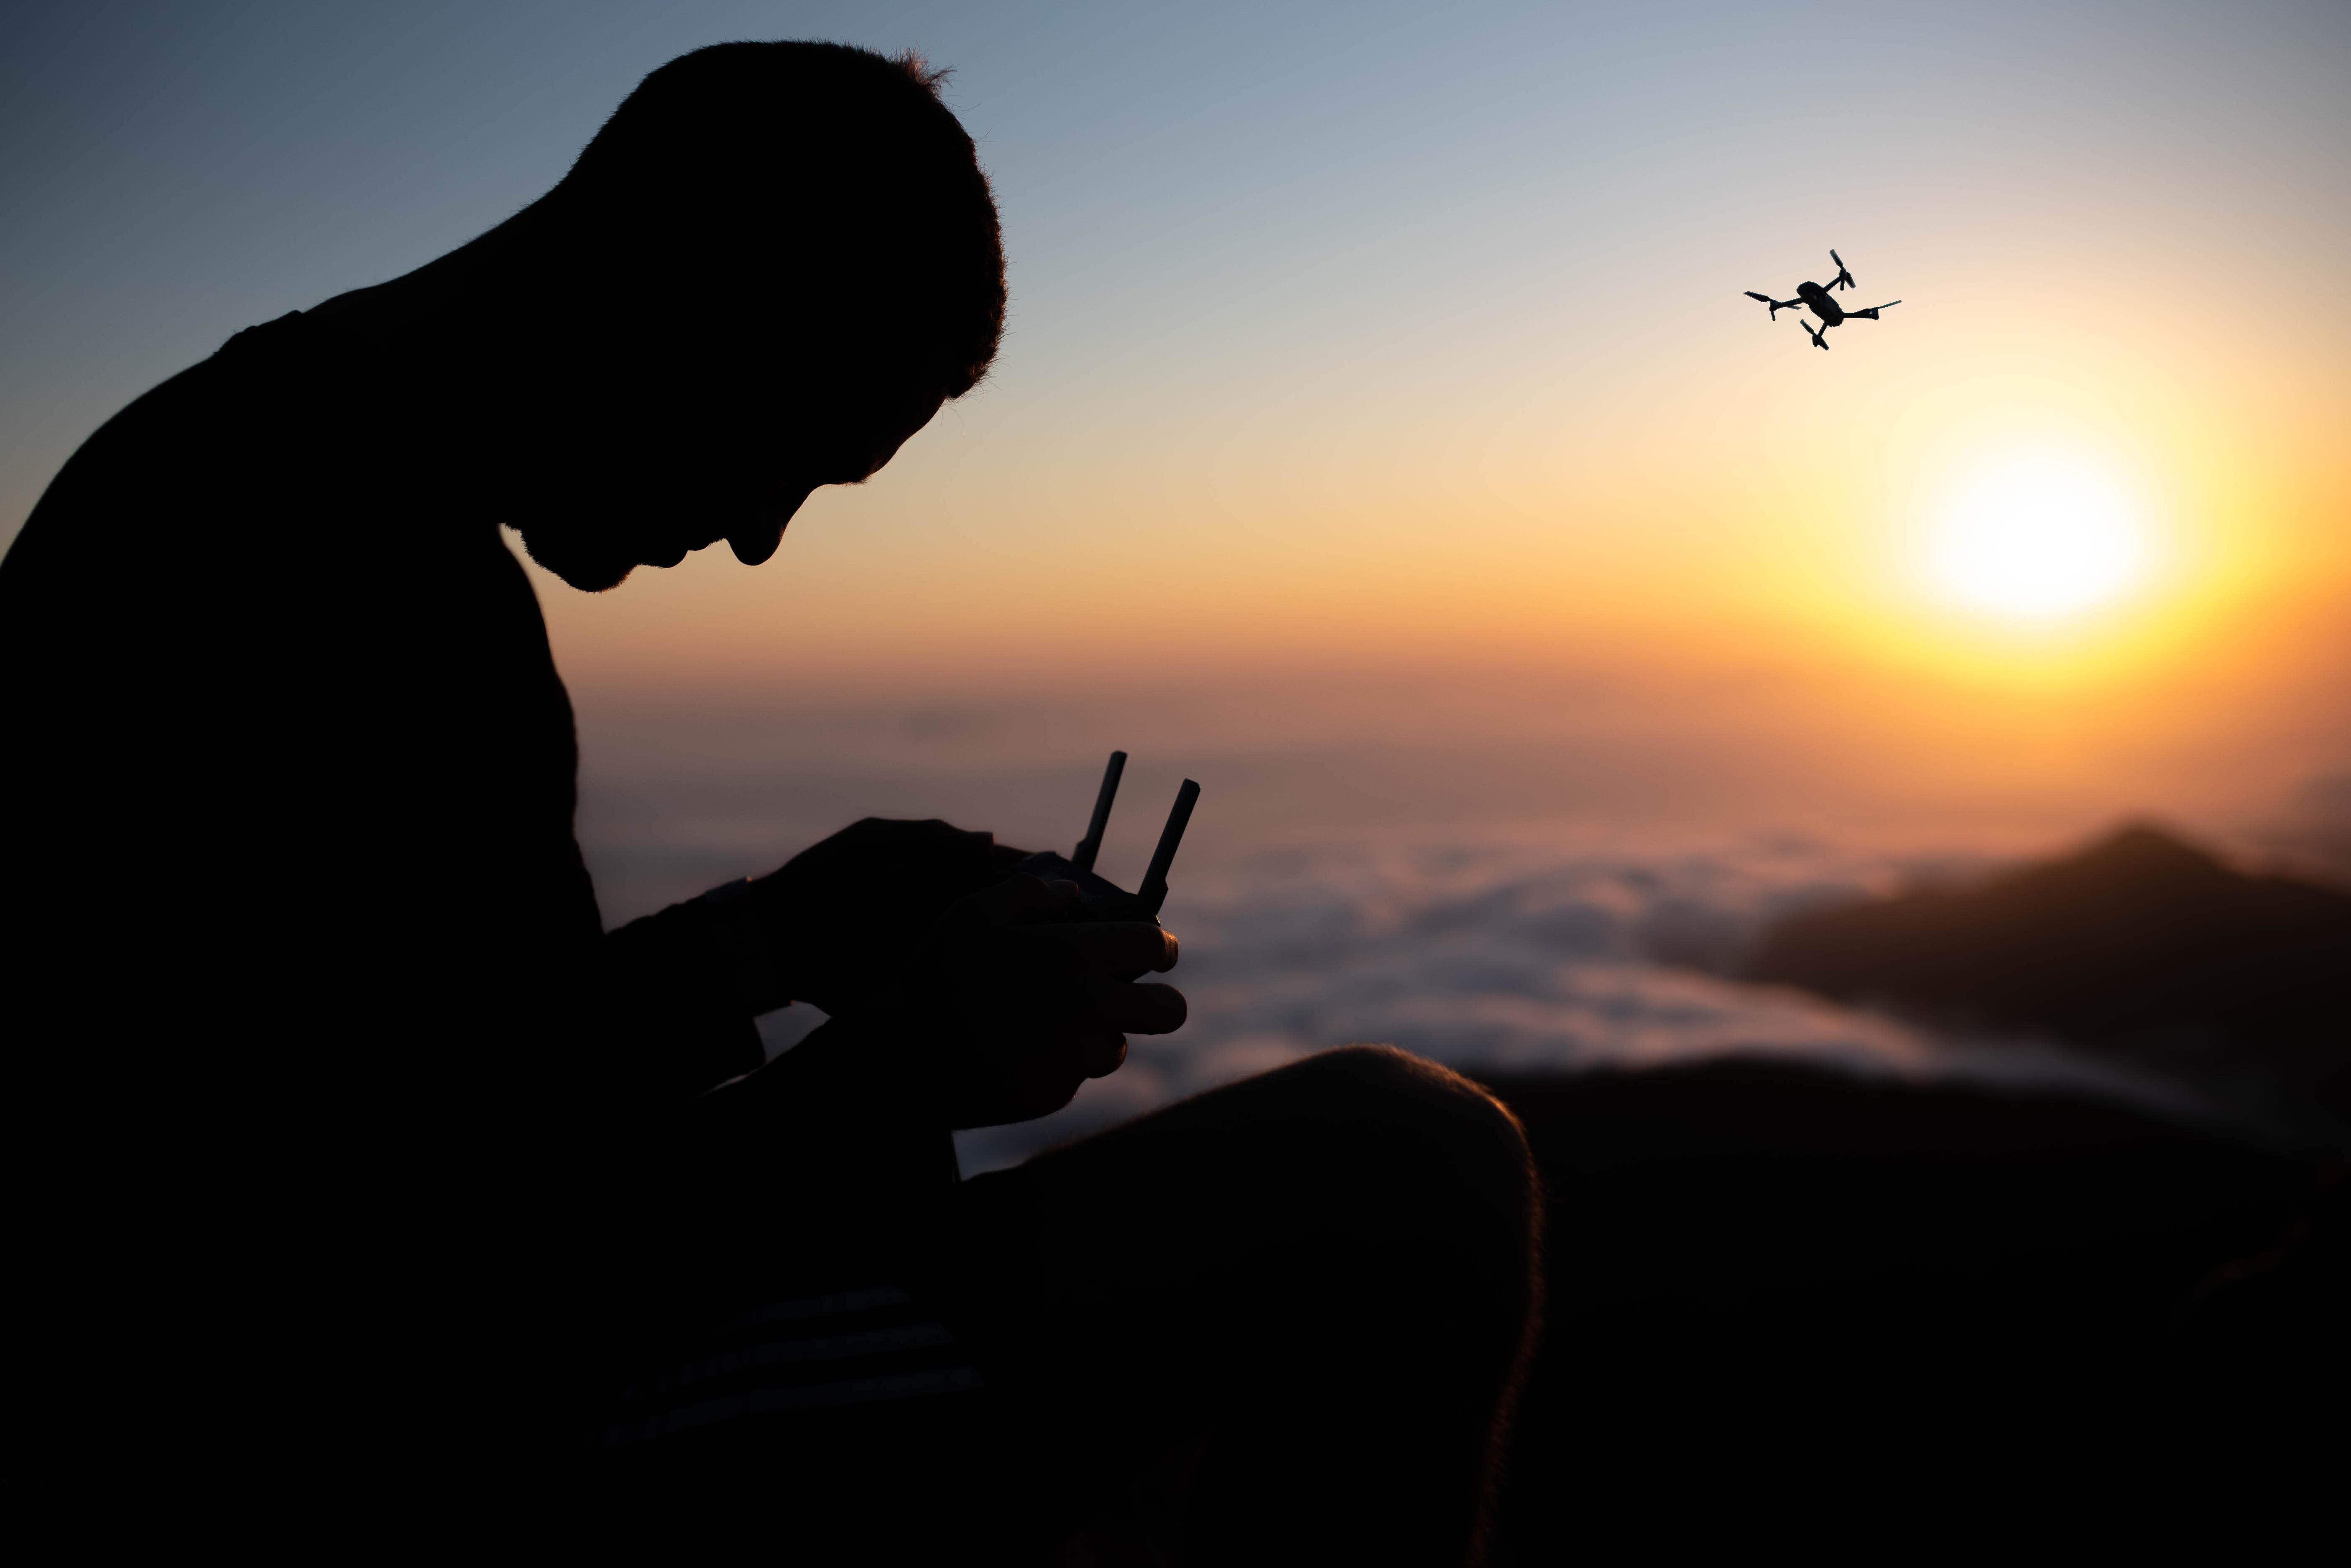 Jeroen Schrage Videography - Drones